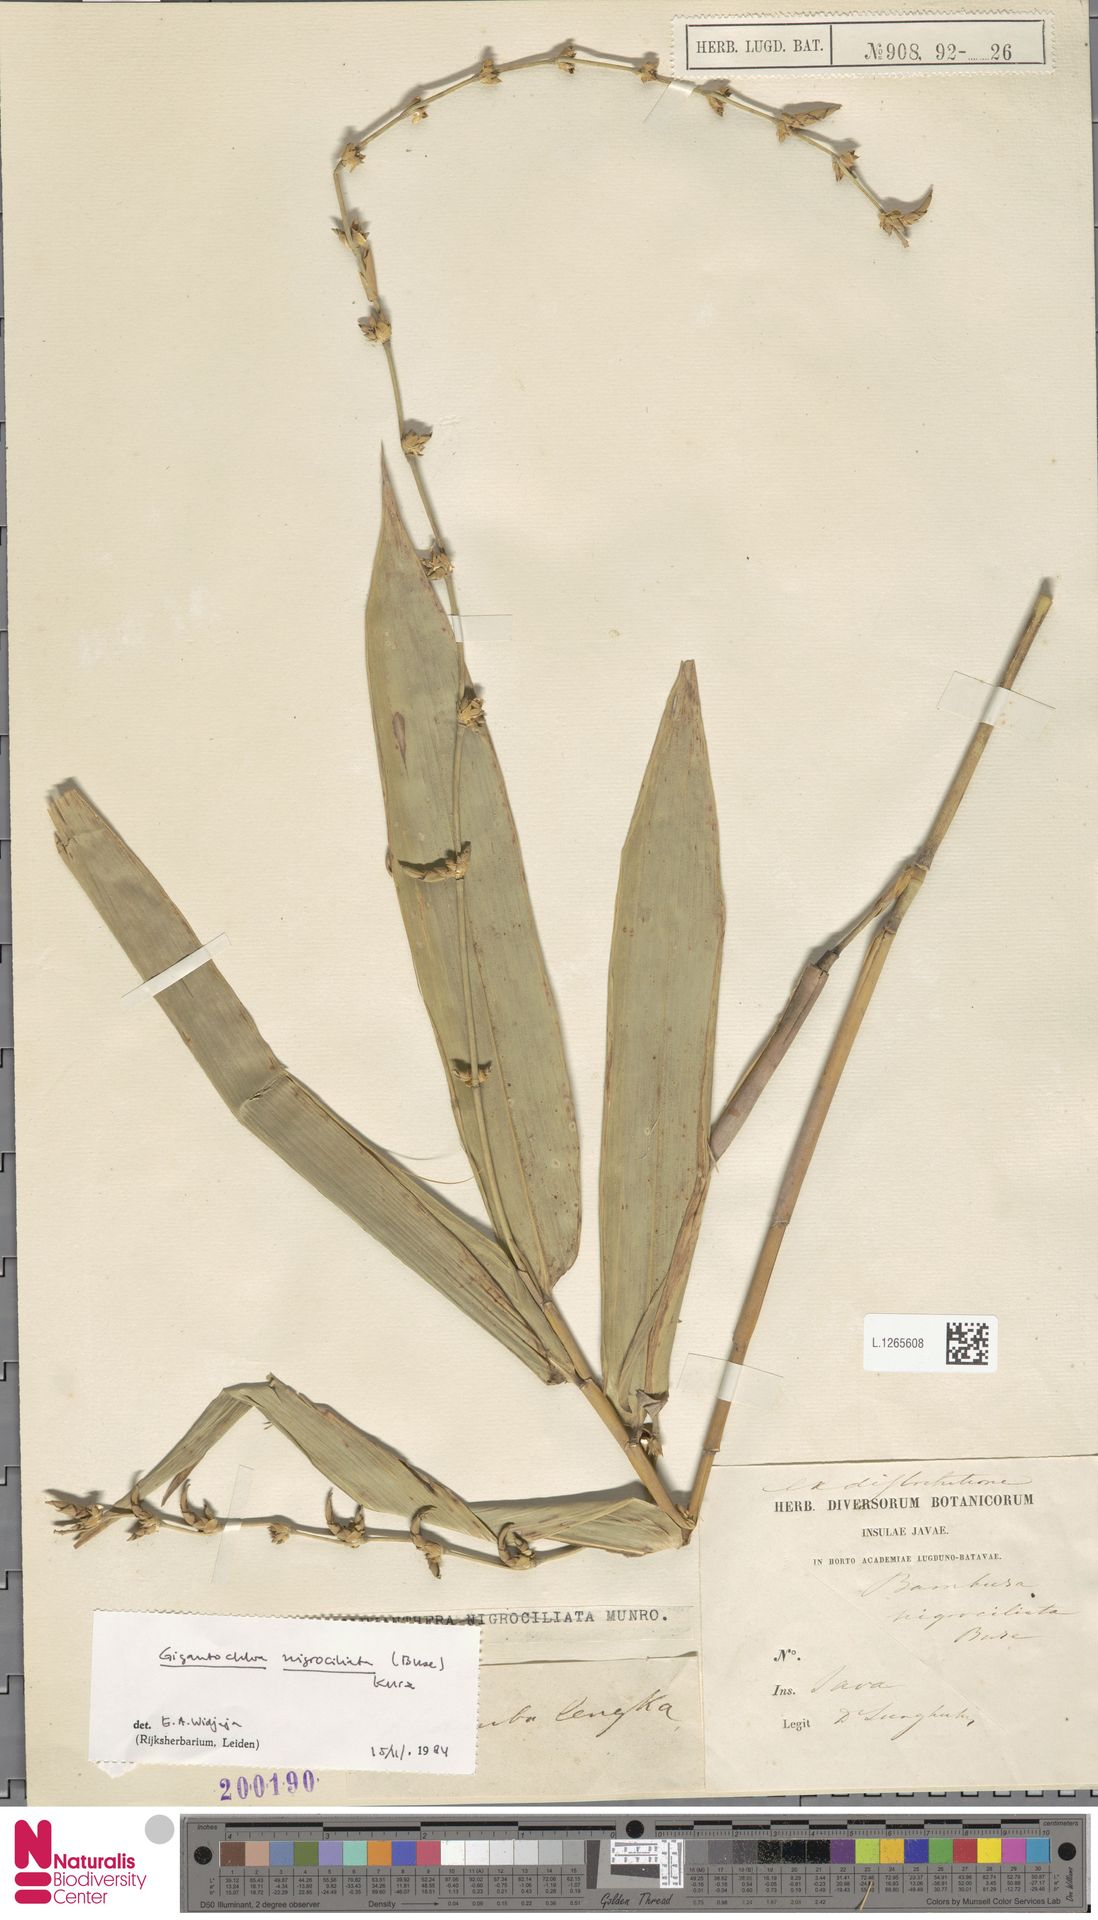 L.1265608 | Gigantochloa nigrociliata Kurz